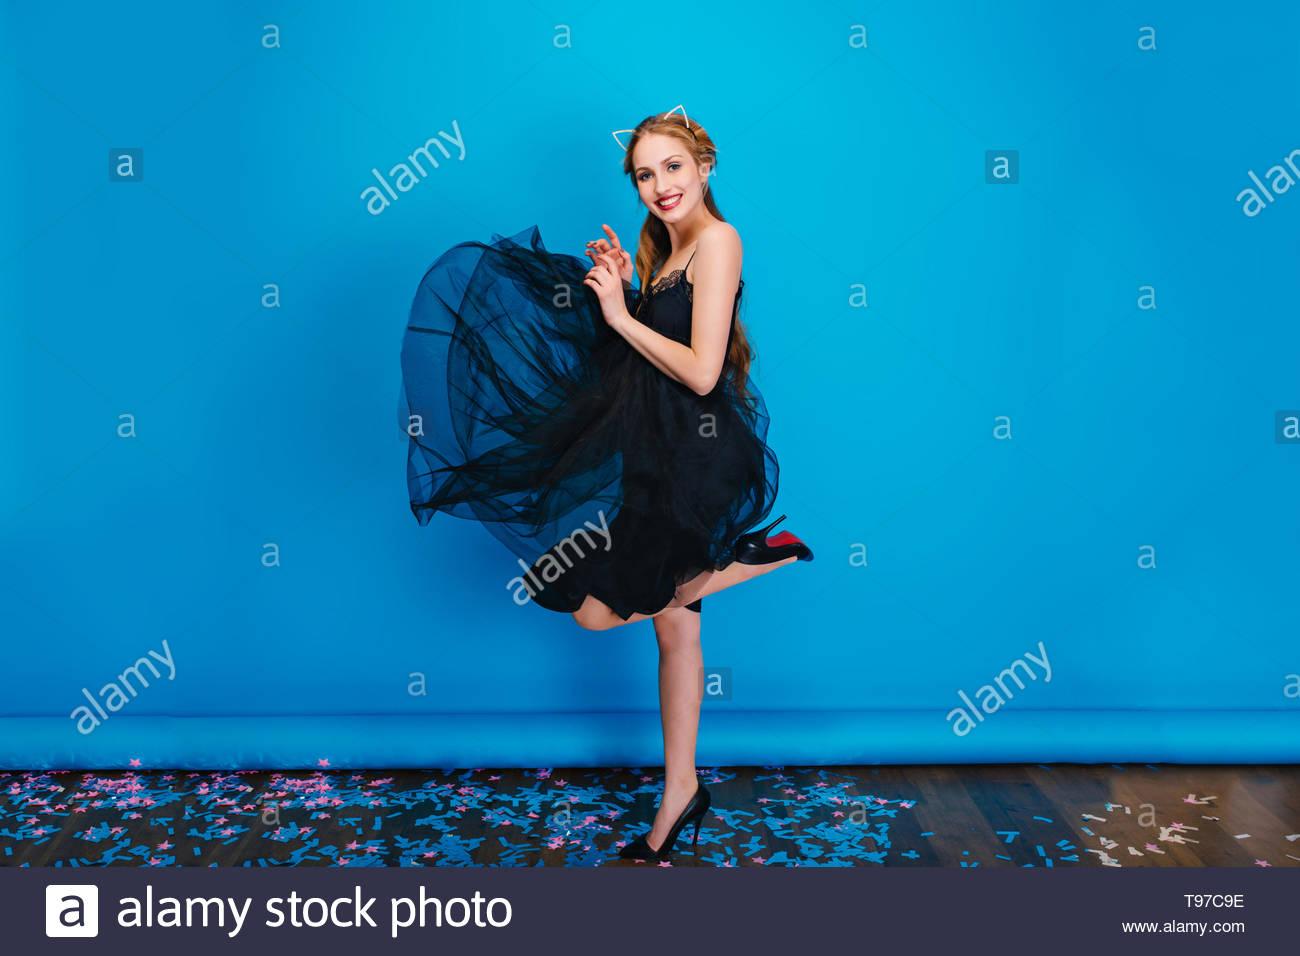 f5a63105bbd Woman Wearing Black Skirt High Heels Stock Photos & Woman Wearing ...